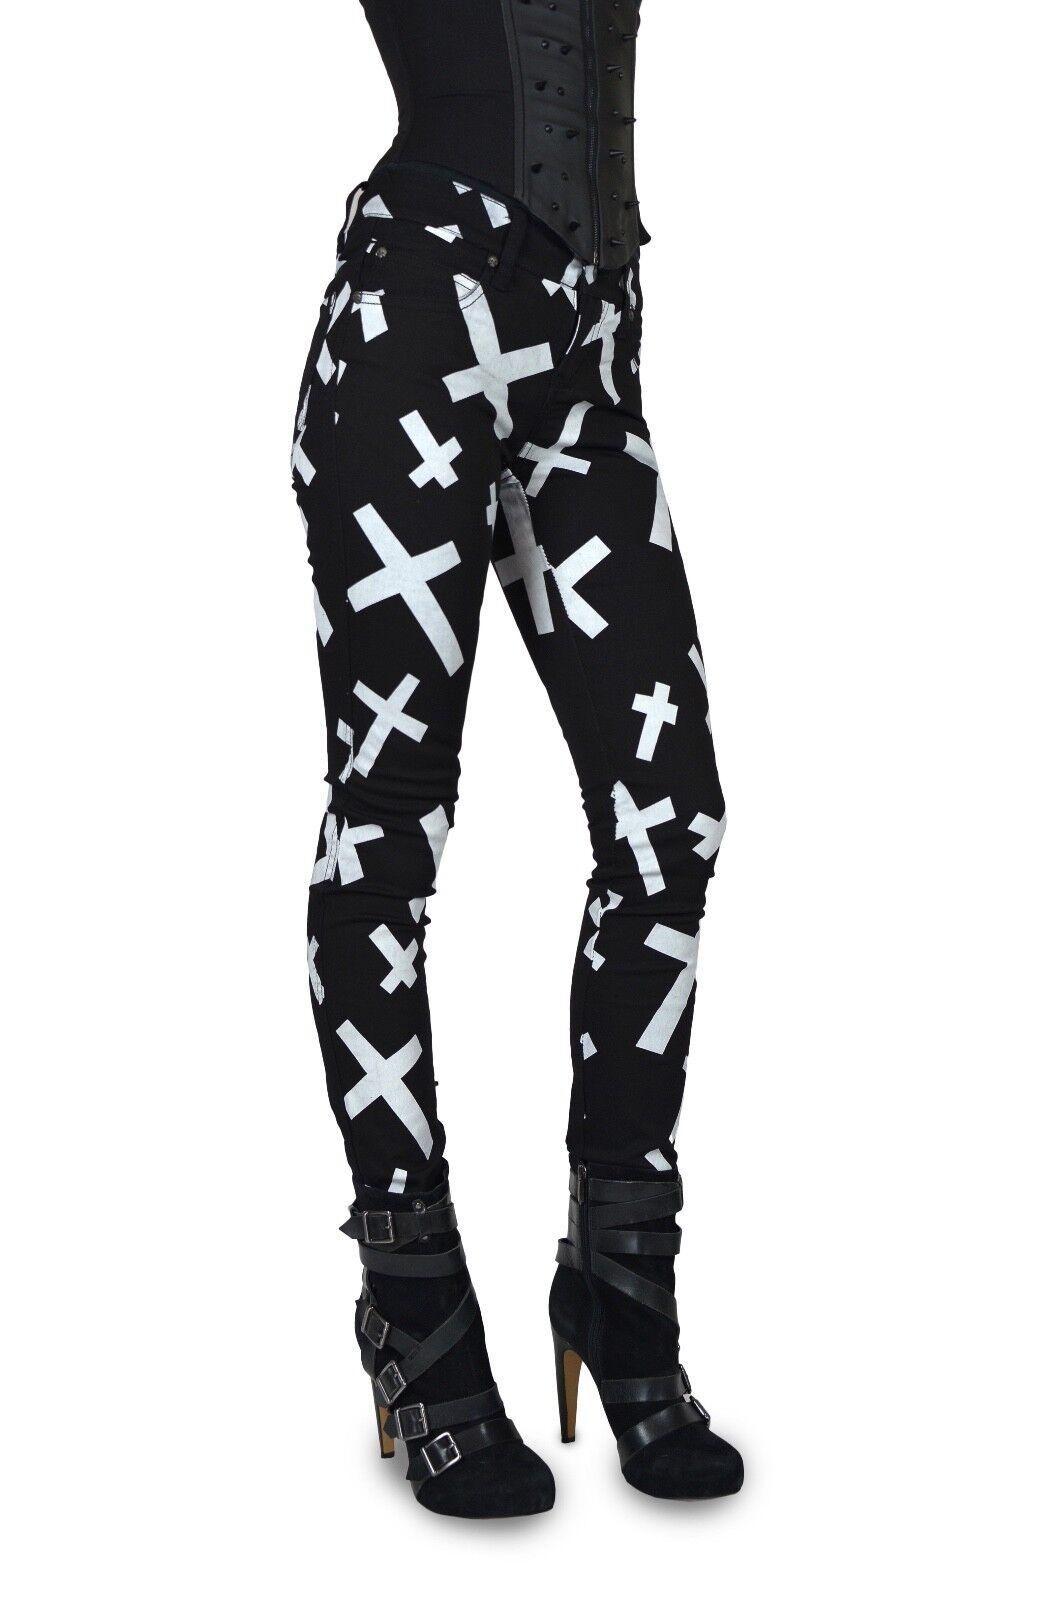 TRIPP EMO GOTH PUNK ROCKER BLACK/WHITE CROSSES JEAN PANTS SKINNY METAL IS6235P Clothing, Shoes & Accessories